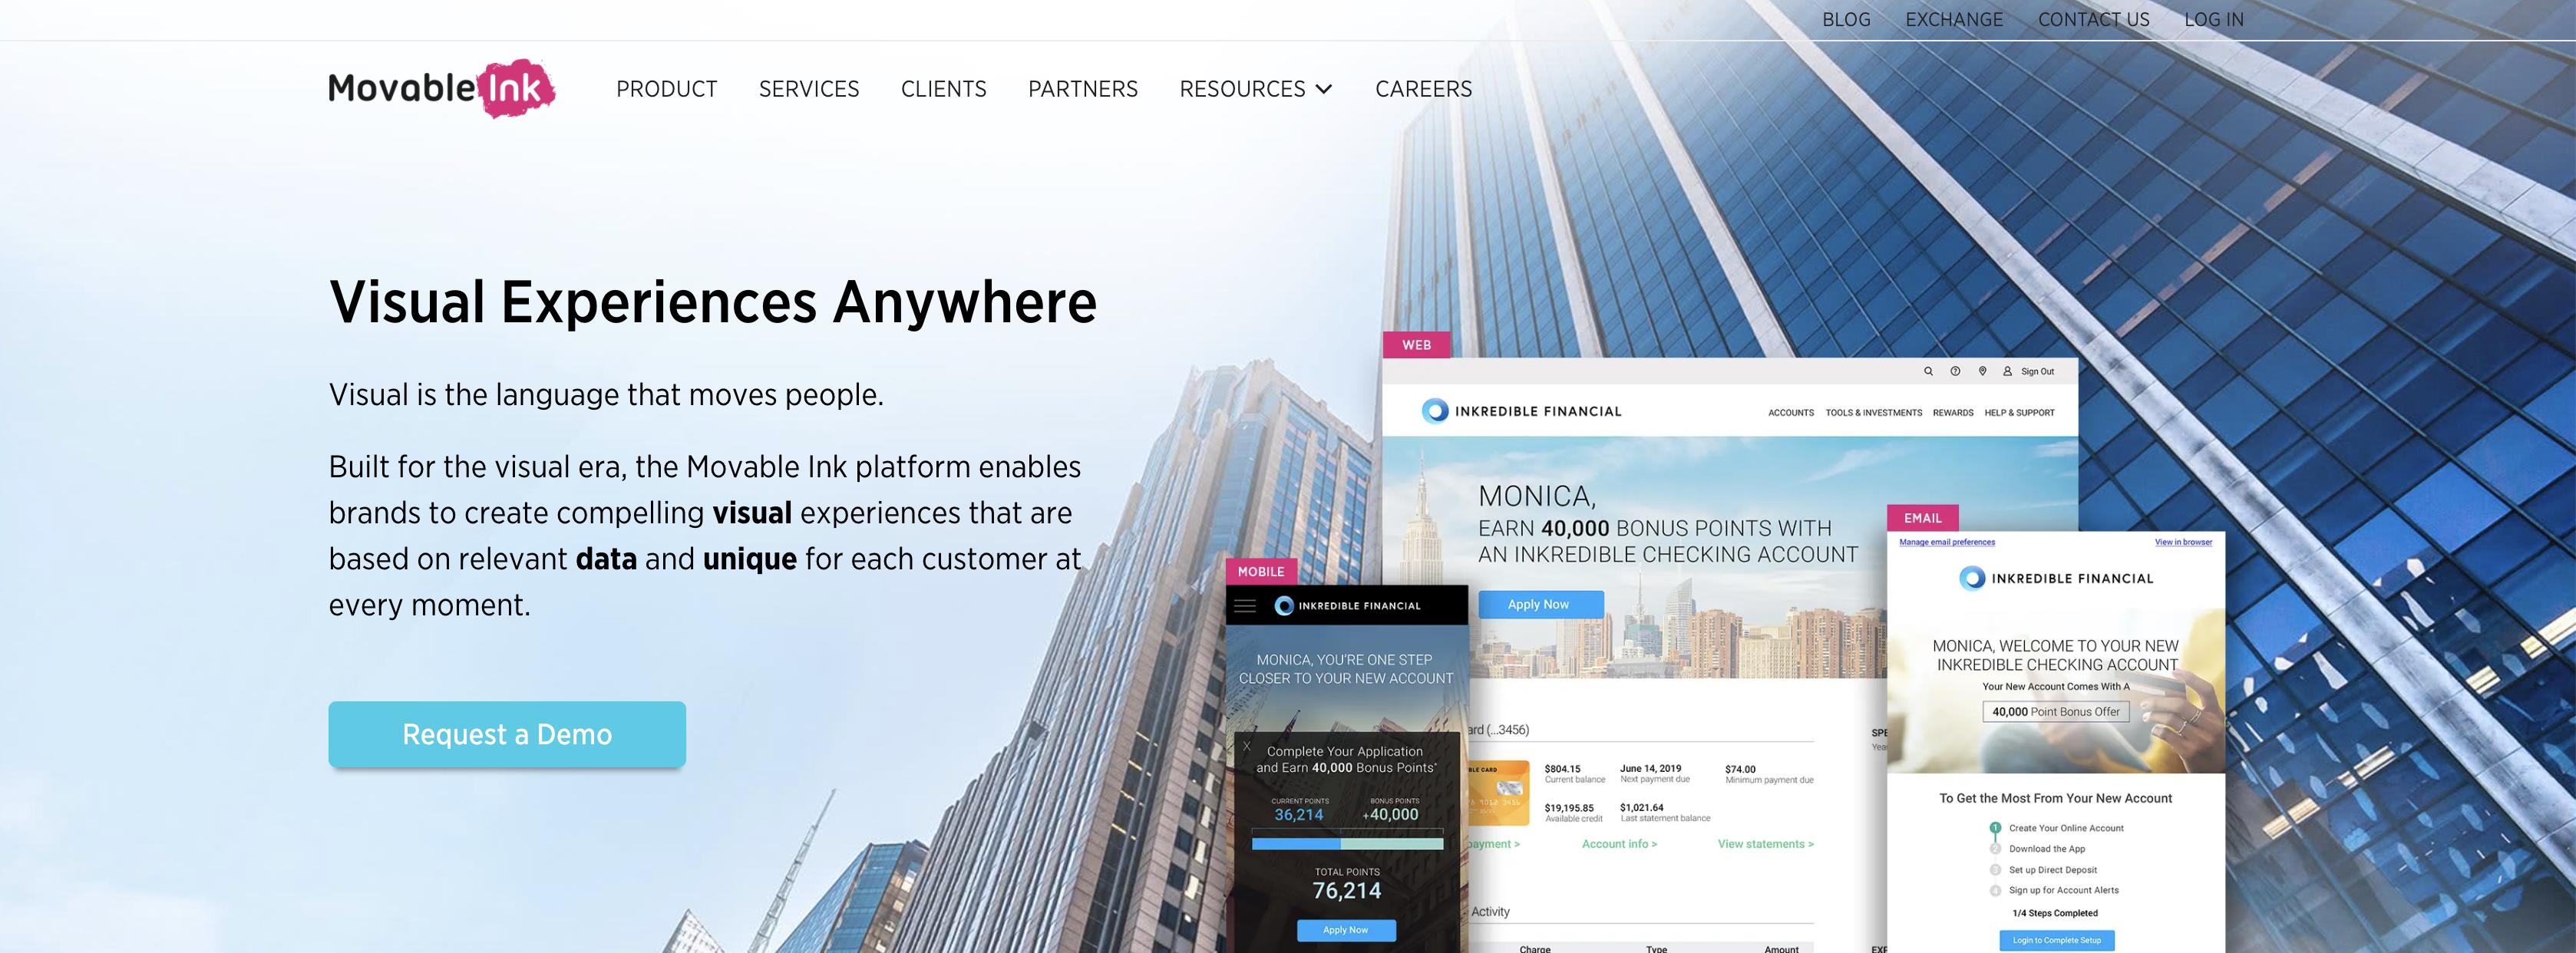 Movable Ink homepage screenshot